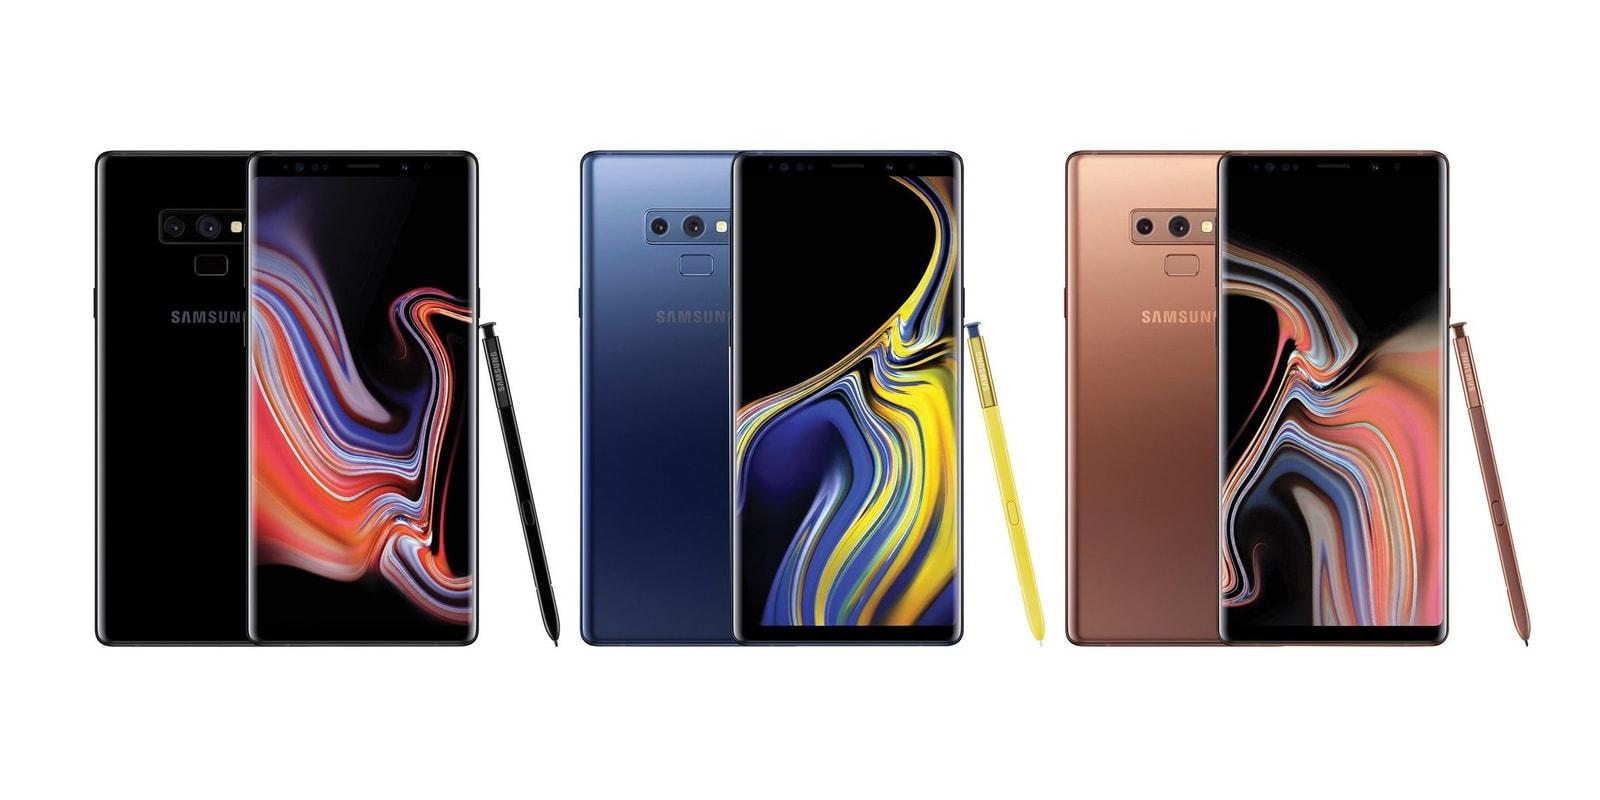 Samsung 正式發佈新一代旗艦手機 Galaxy Note 9